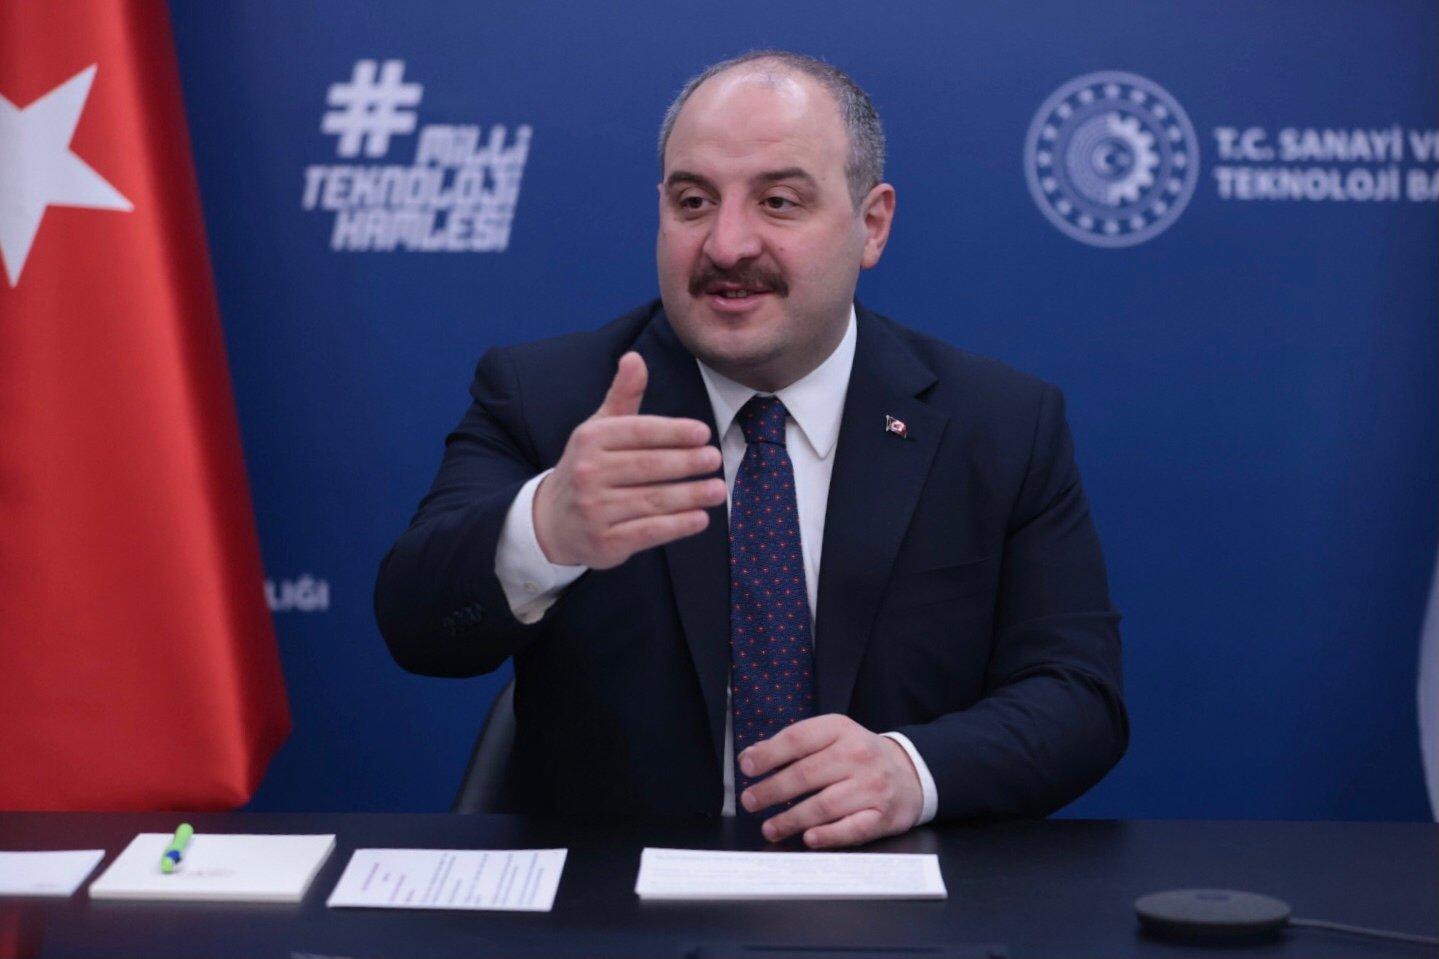 Industry and Technology Minister Mustafa Varank attends the Uludağ Economy Summit via videoconference, Ankara, Turkey, March 25, 2021. (AA Photo)